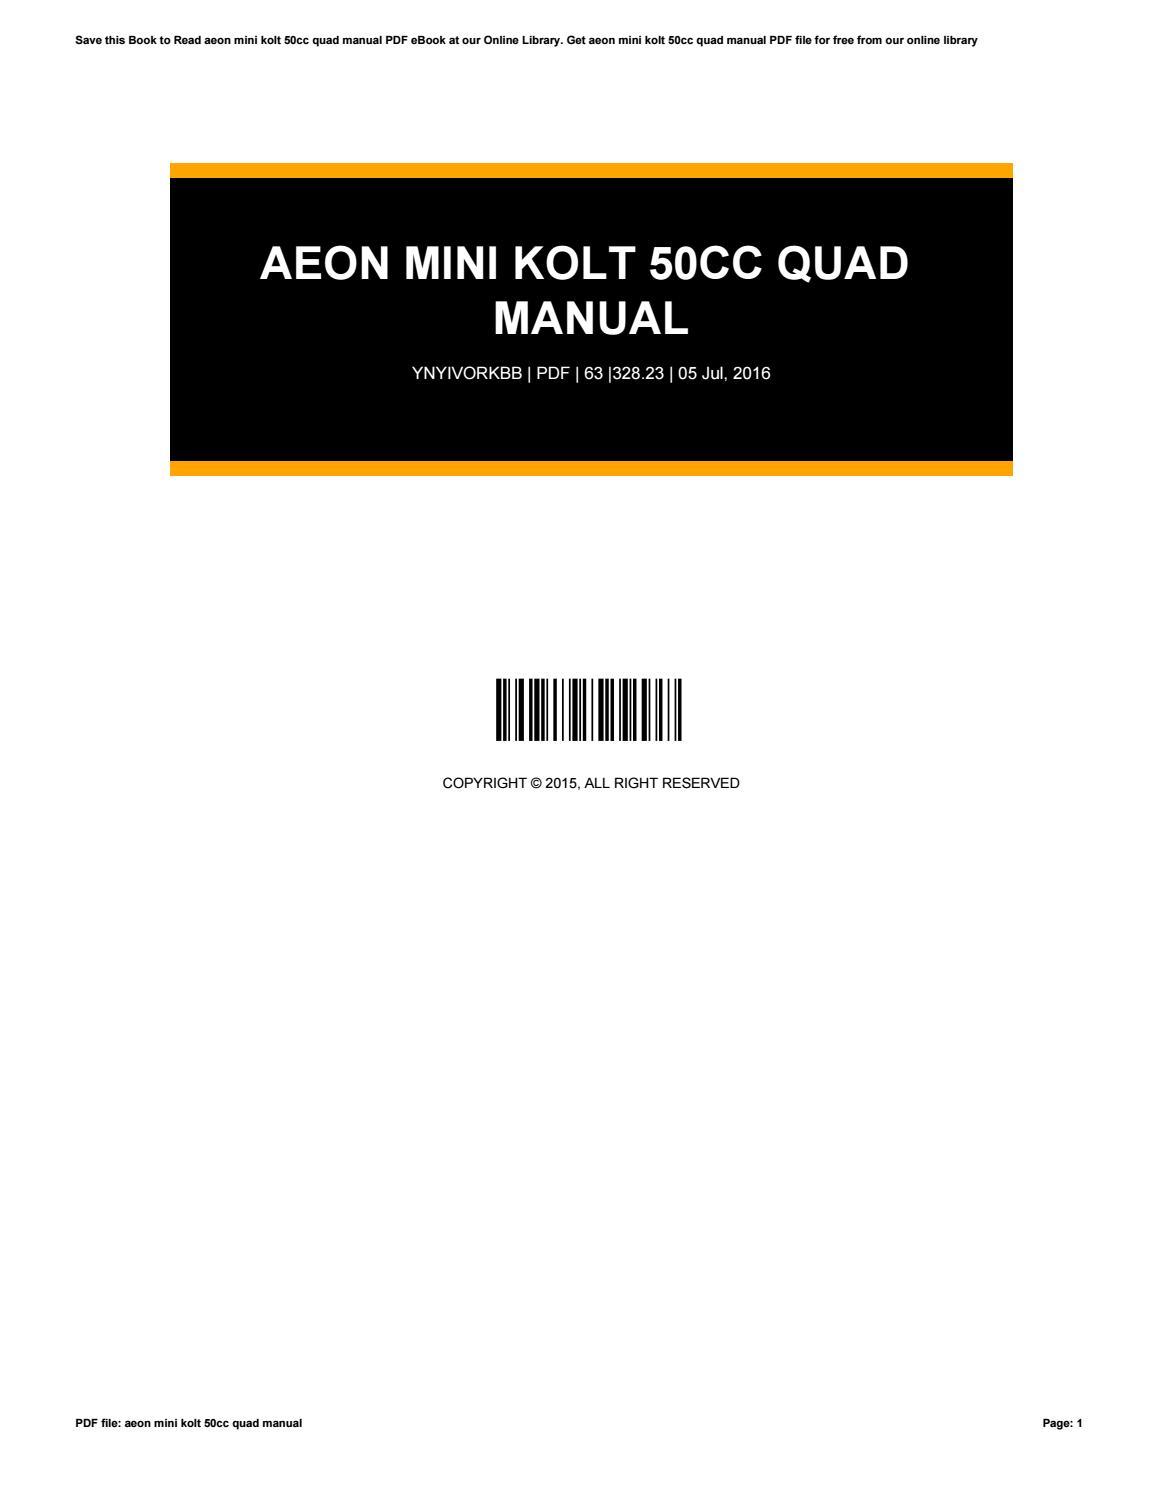 Aeon Mini Kolt 50cc Quad Manual By Helen Issuu